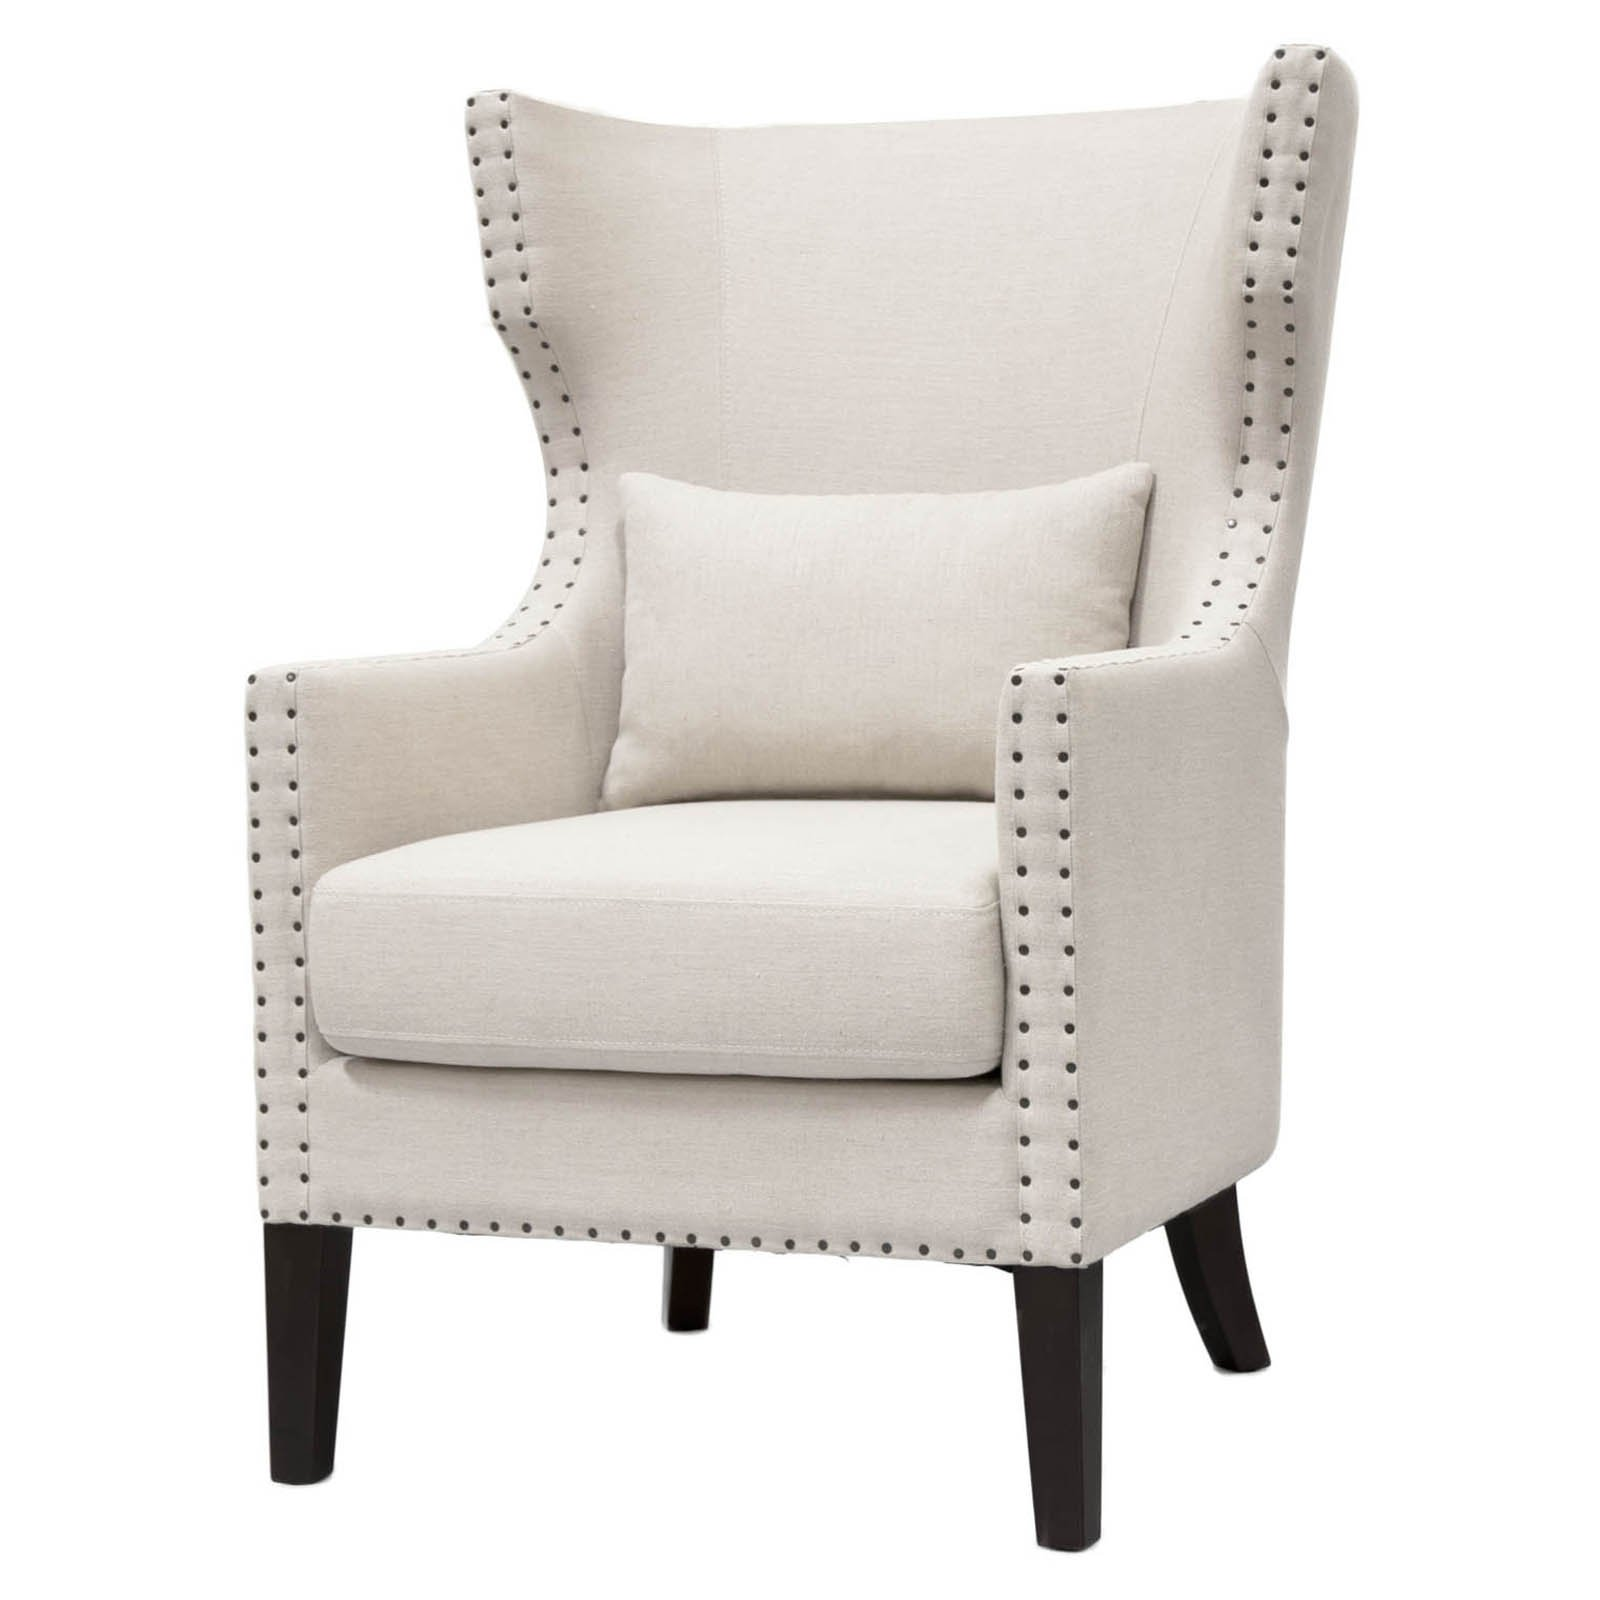 Orient Express Furniture Berkley Wingback Accent Chair